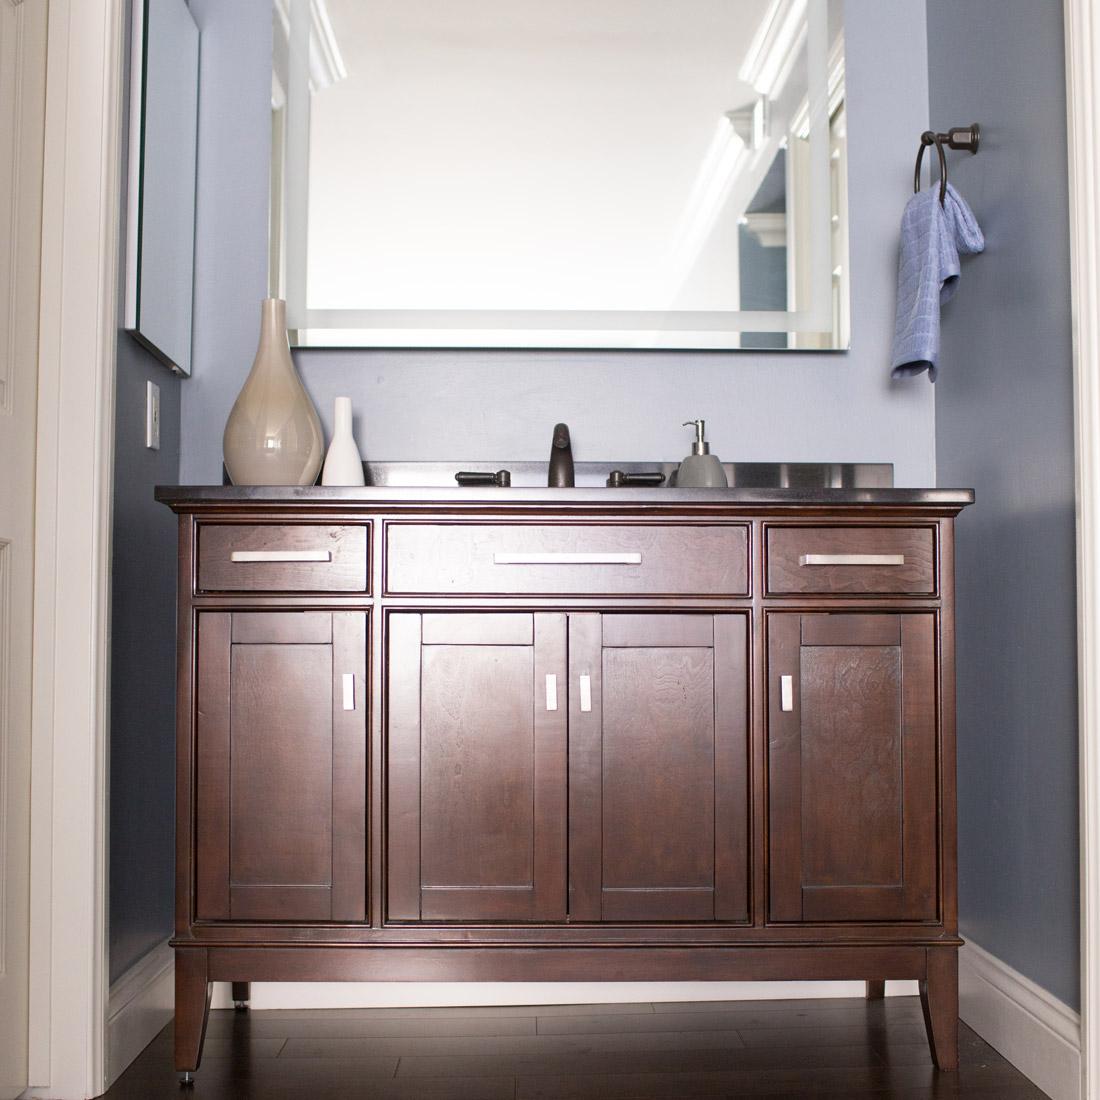 master bathroom vanity with dark stone top and backlit mirror in bedroom with grey blue walls design by sara bates interior design